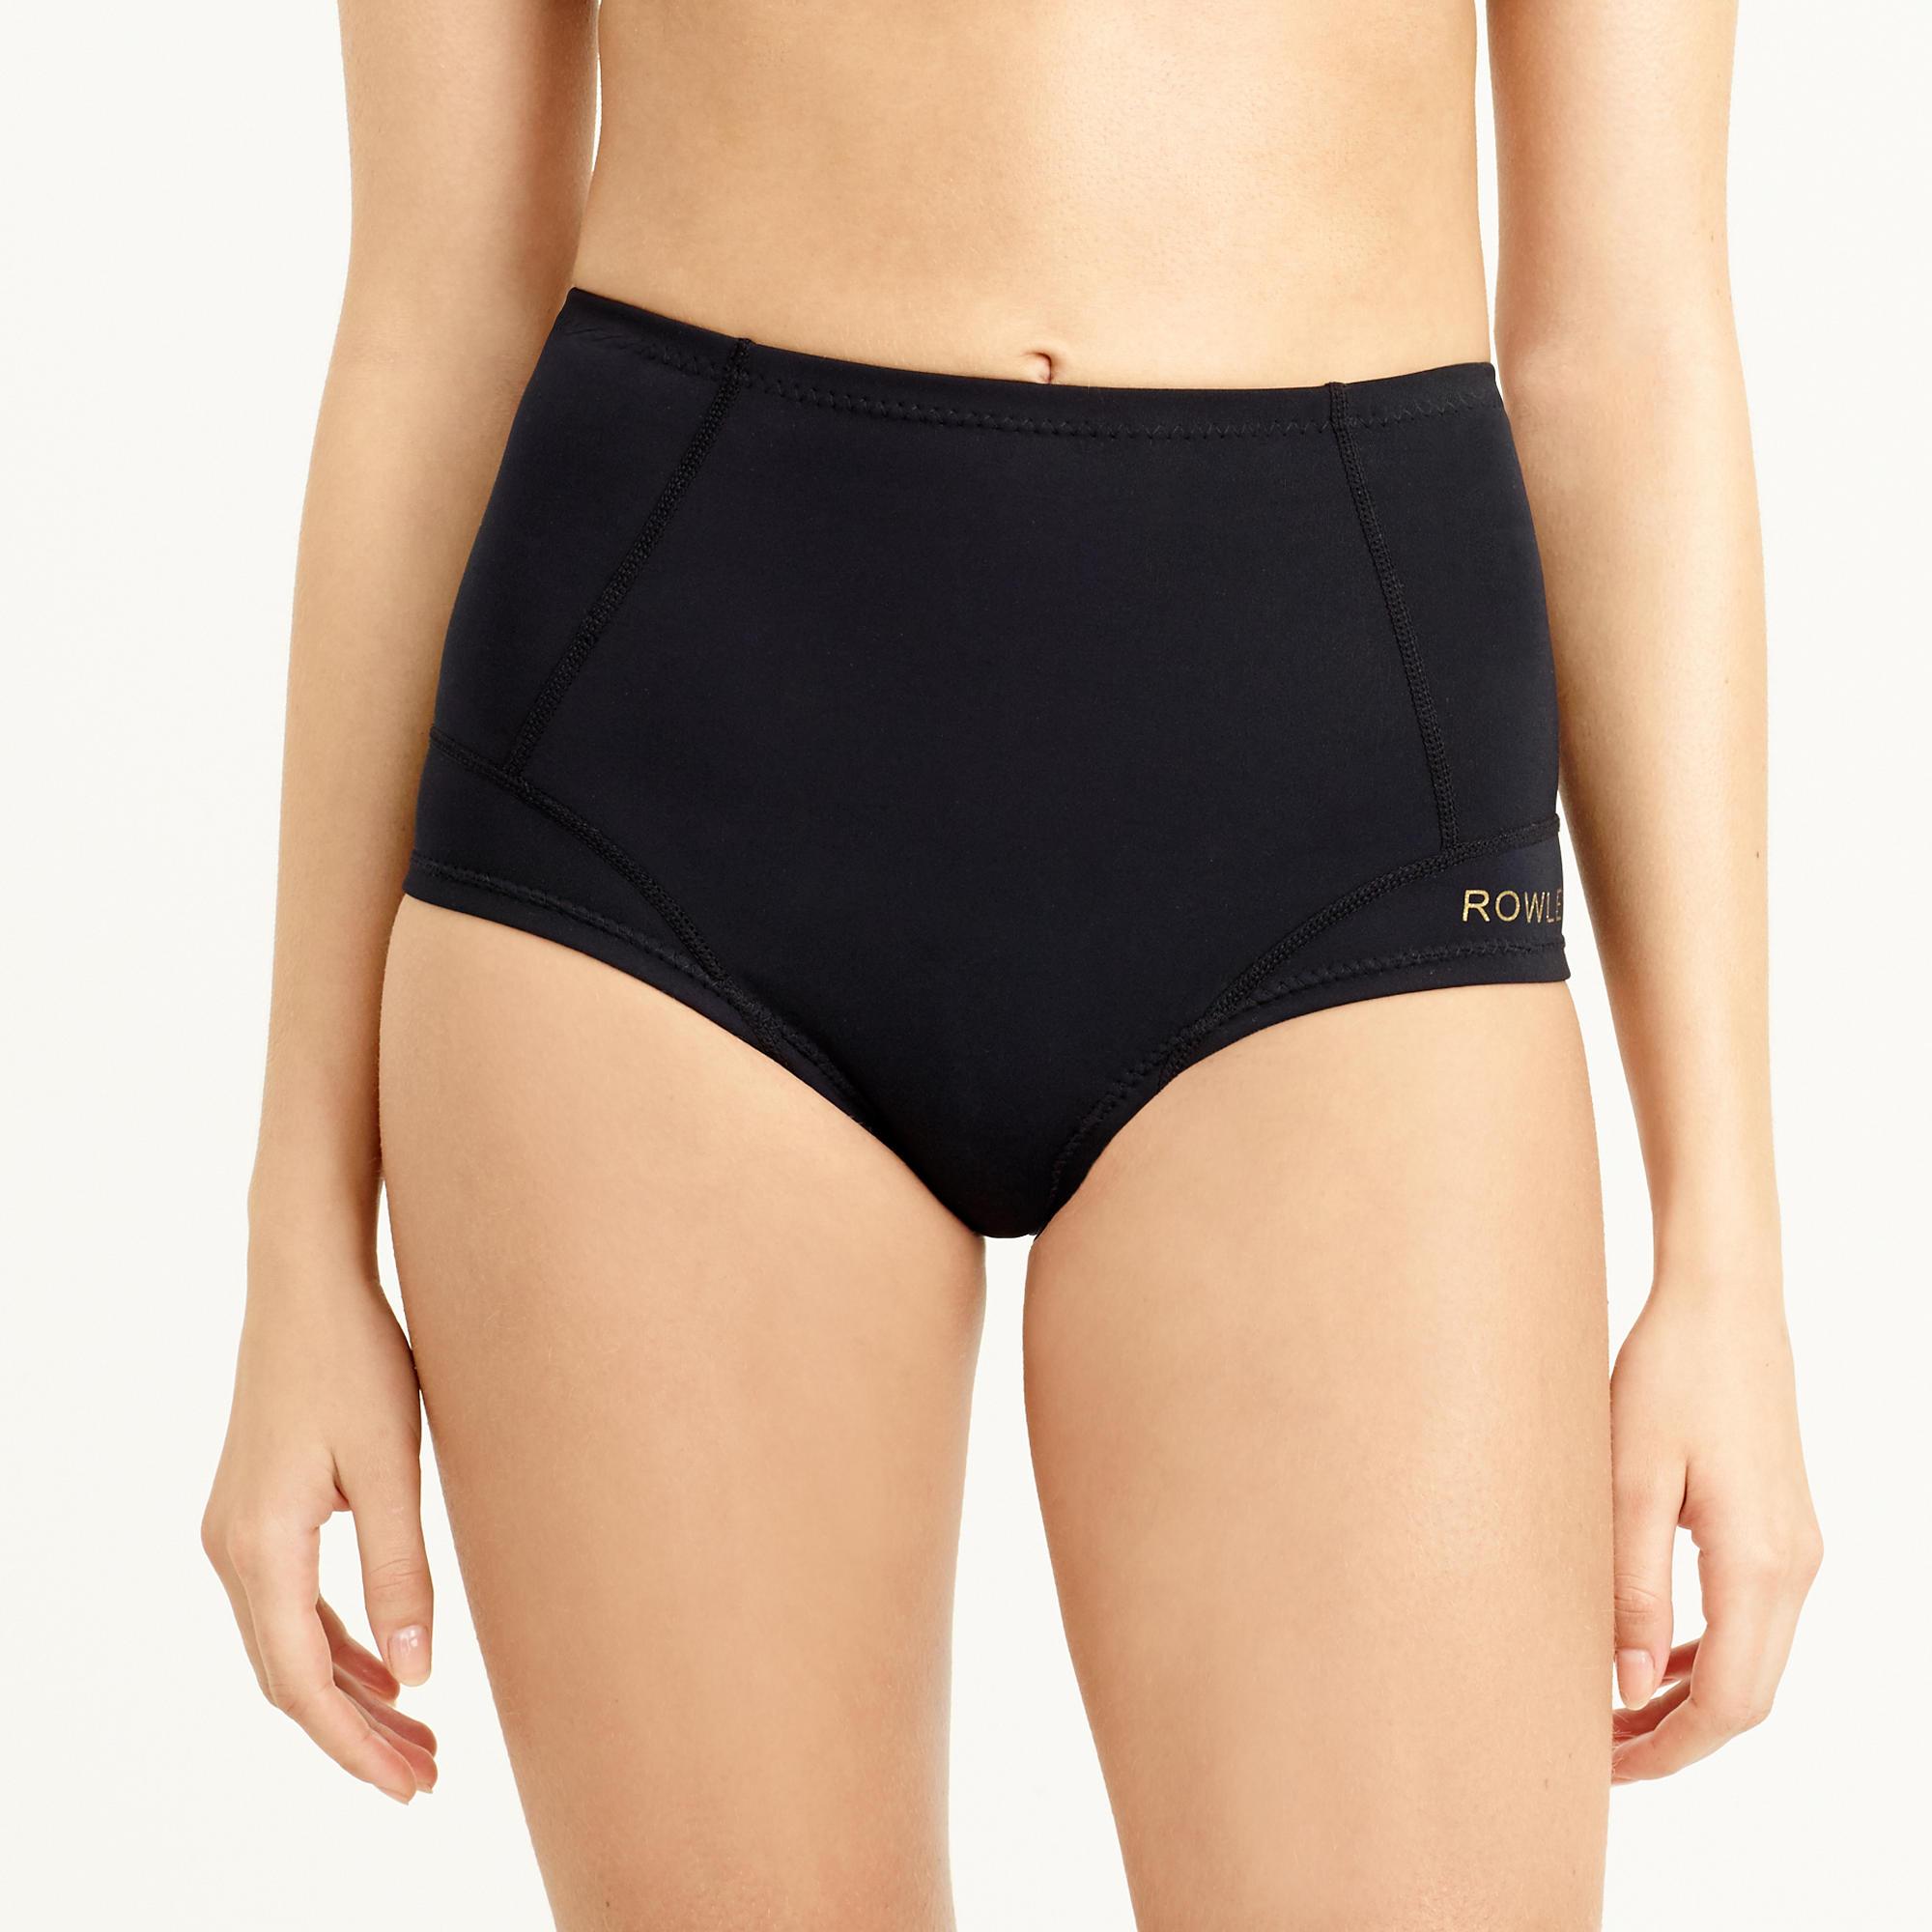 e78aec9639e Lyst - J.Crew Cynthia Rowley High-waisted Bikini Bottom in Black